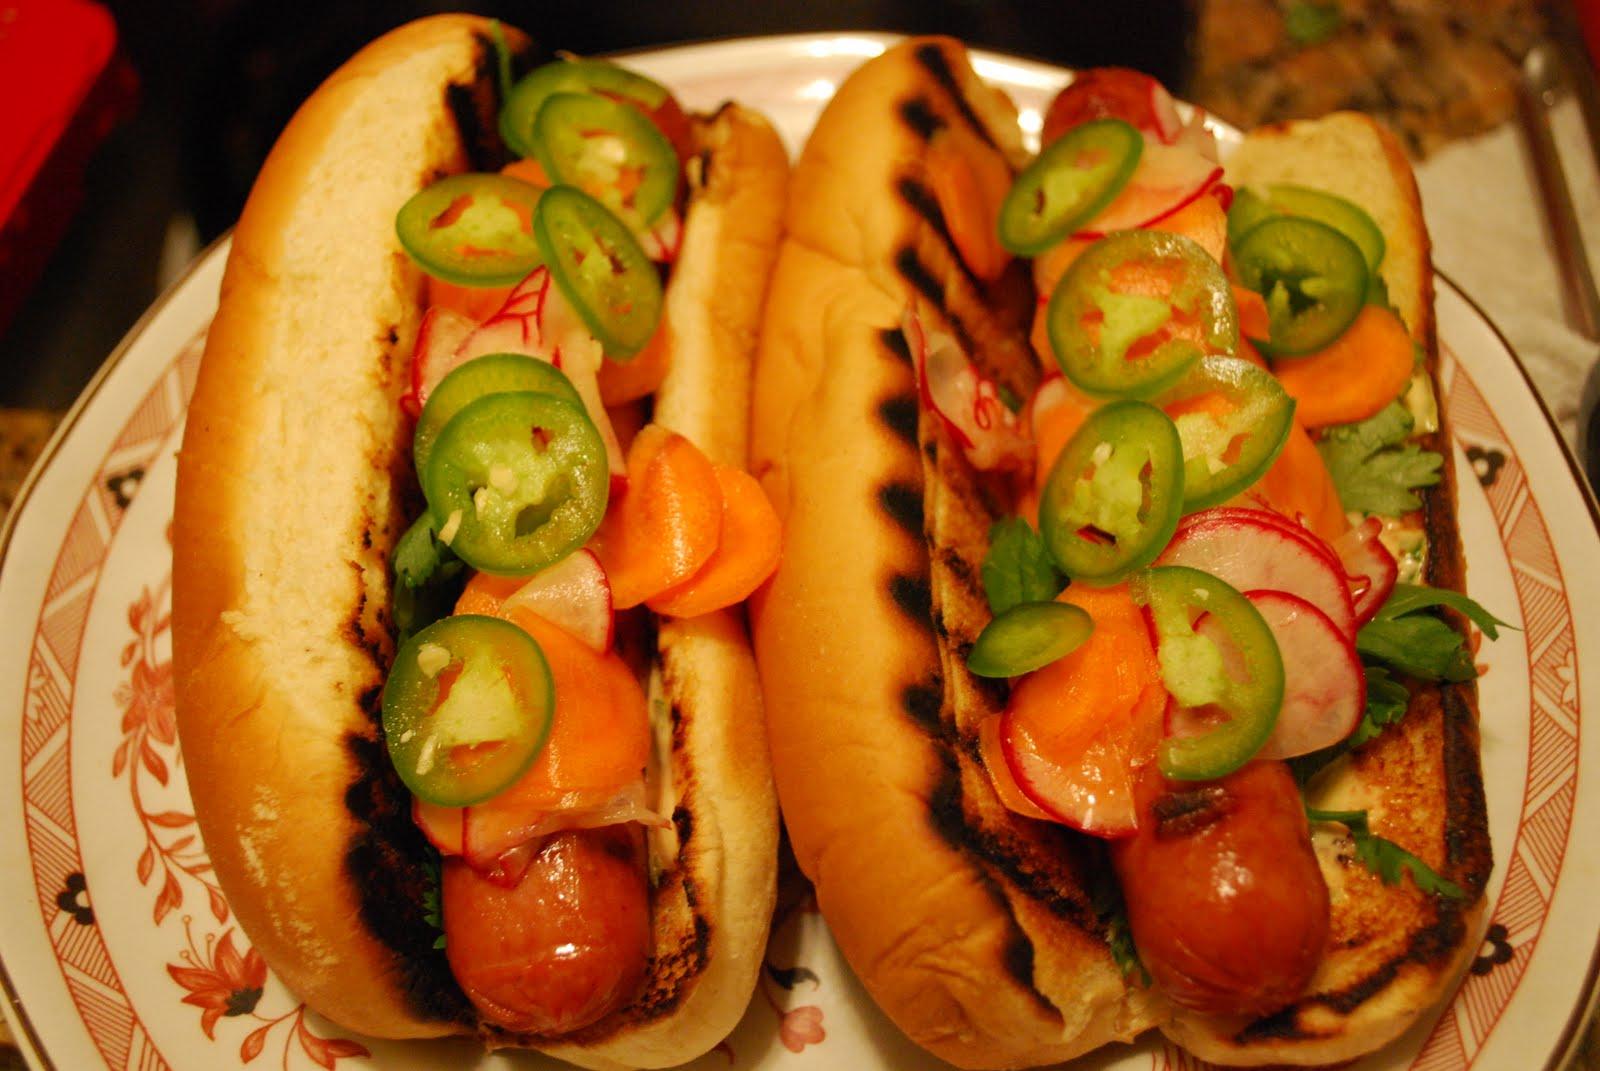 Sybil's Spoon: Banh Mi Hot Dogs